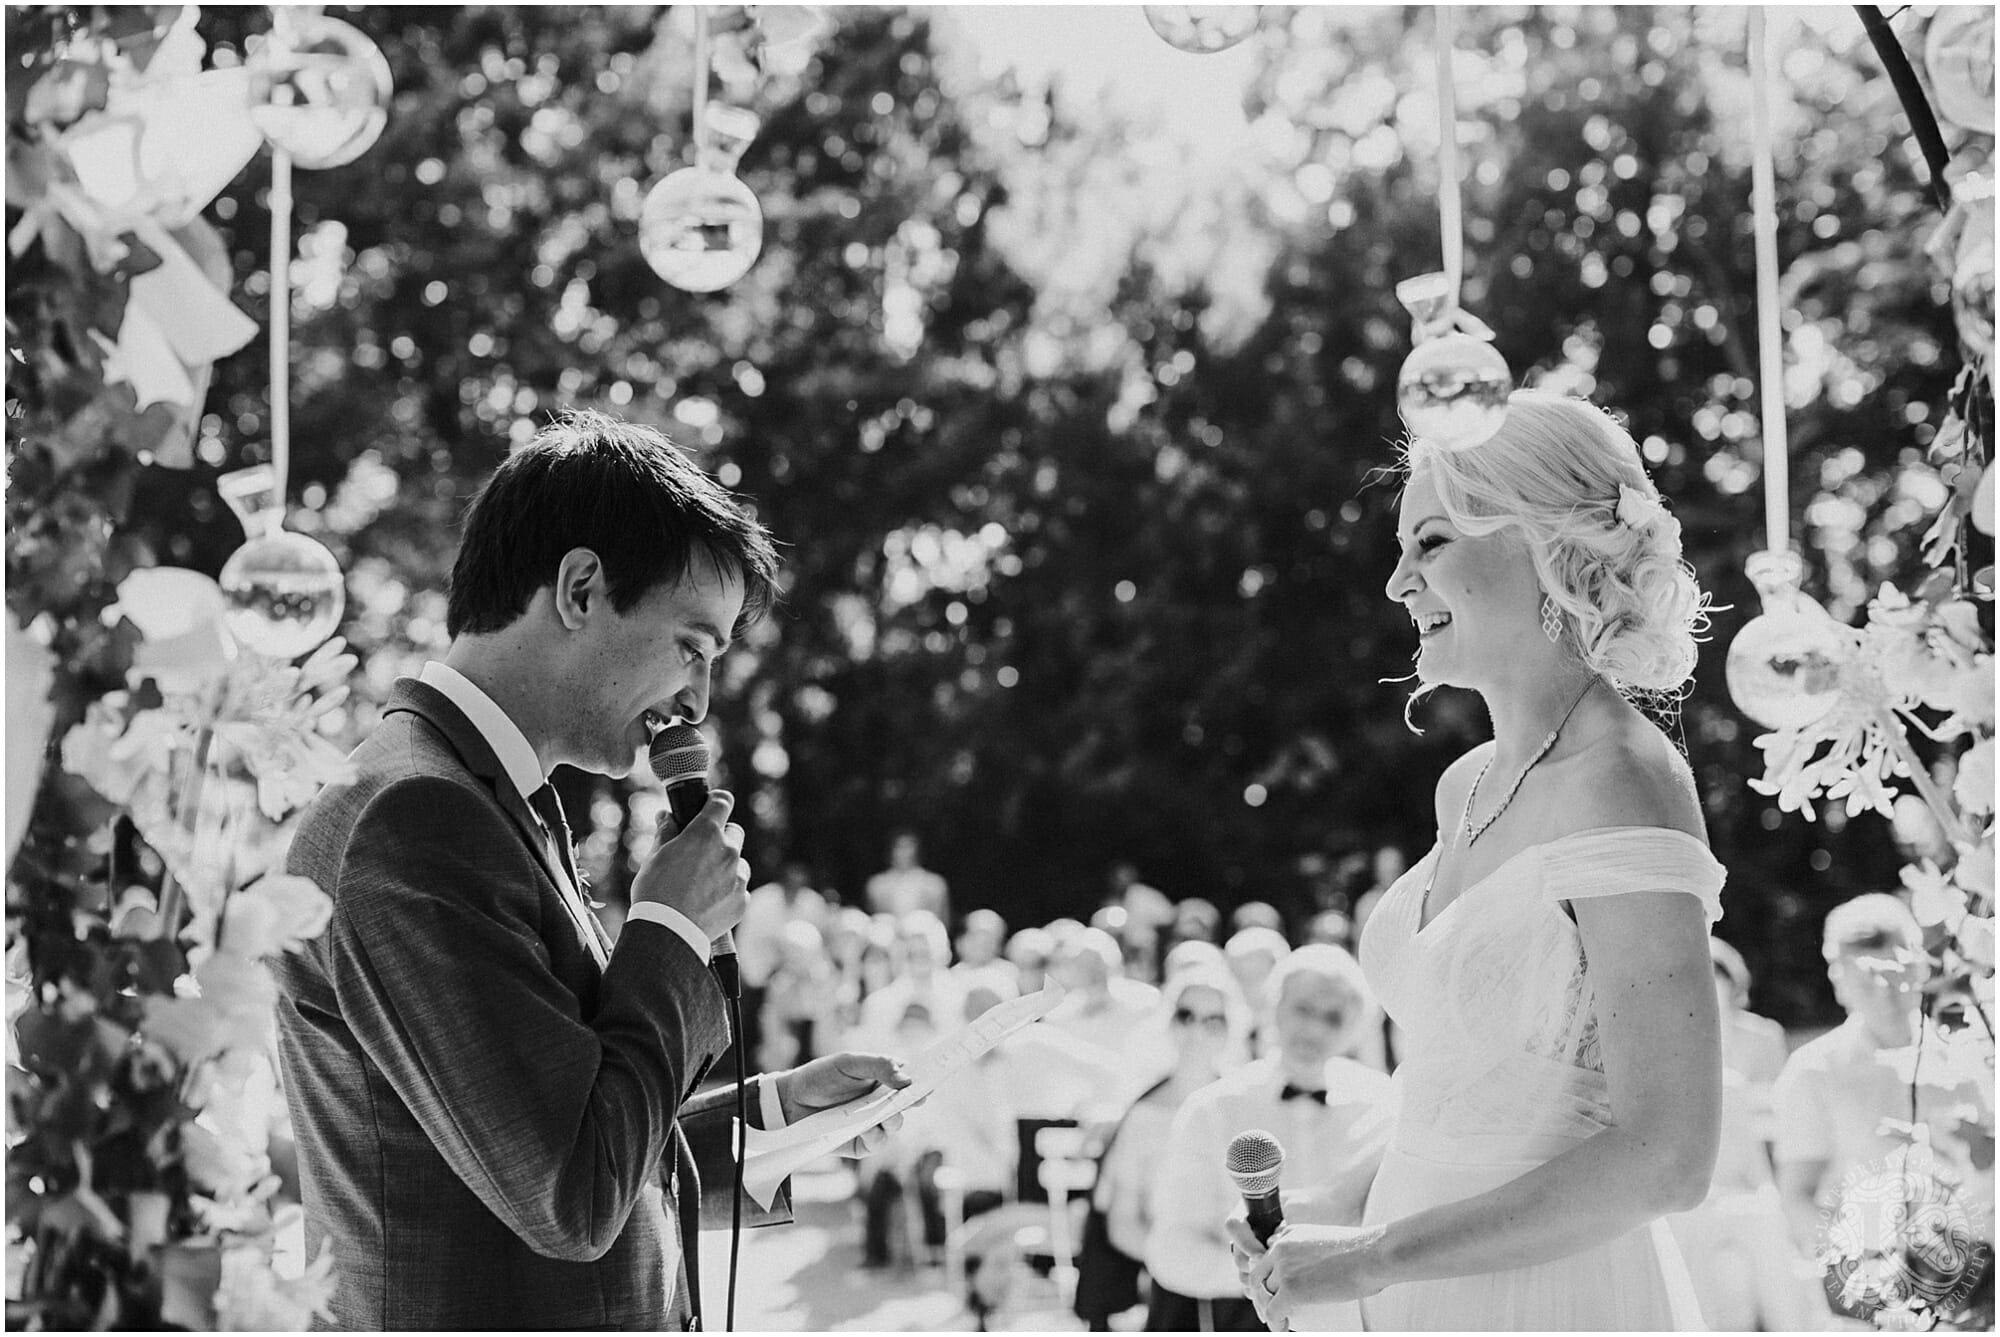 Kateryna-photos-photographe-mariage-chateau-des-3-fontaines-provence-avignon-vaucluse-sud_0055.jpg